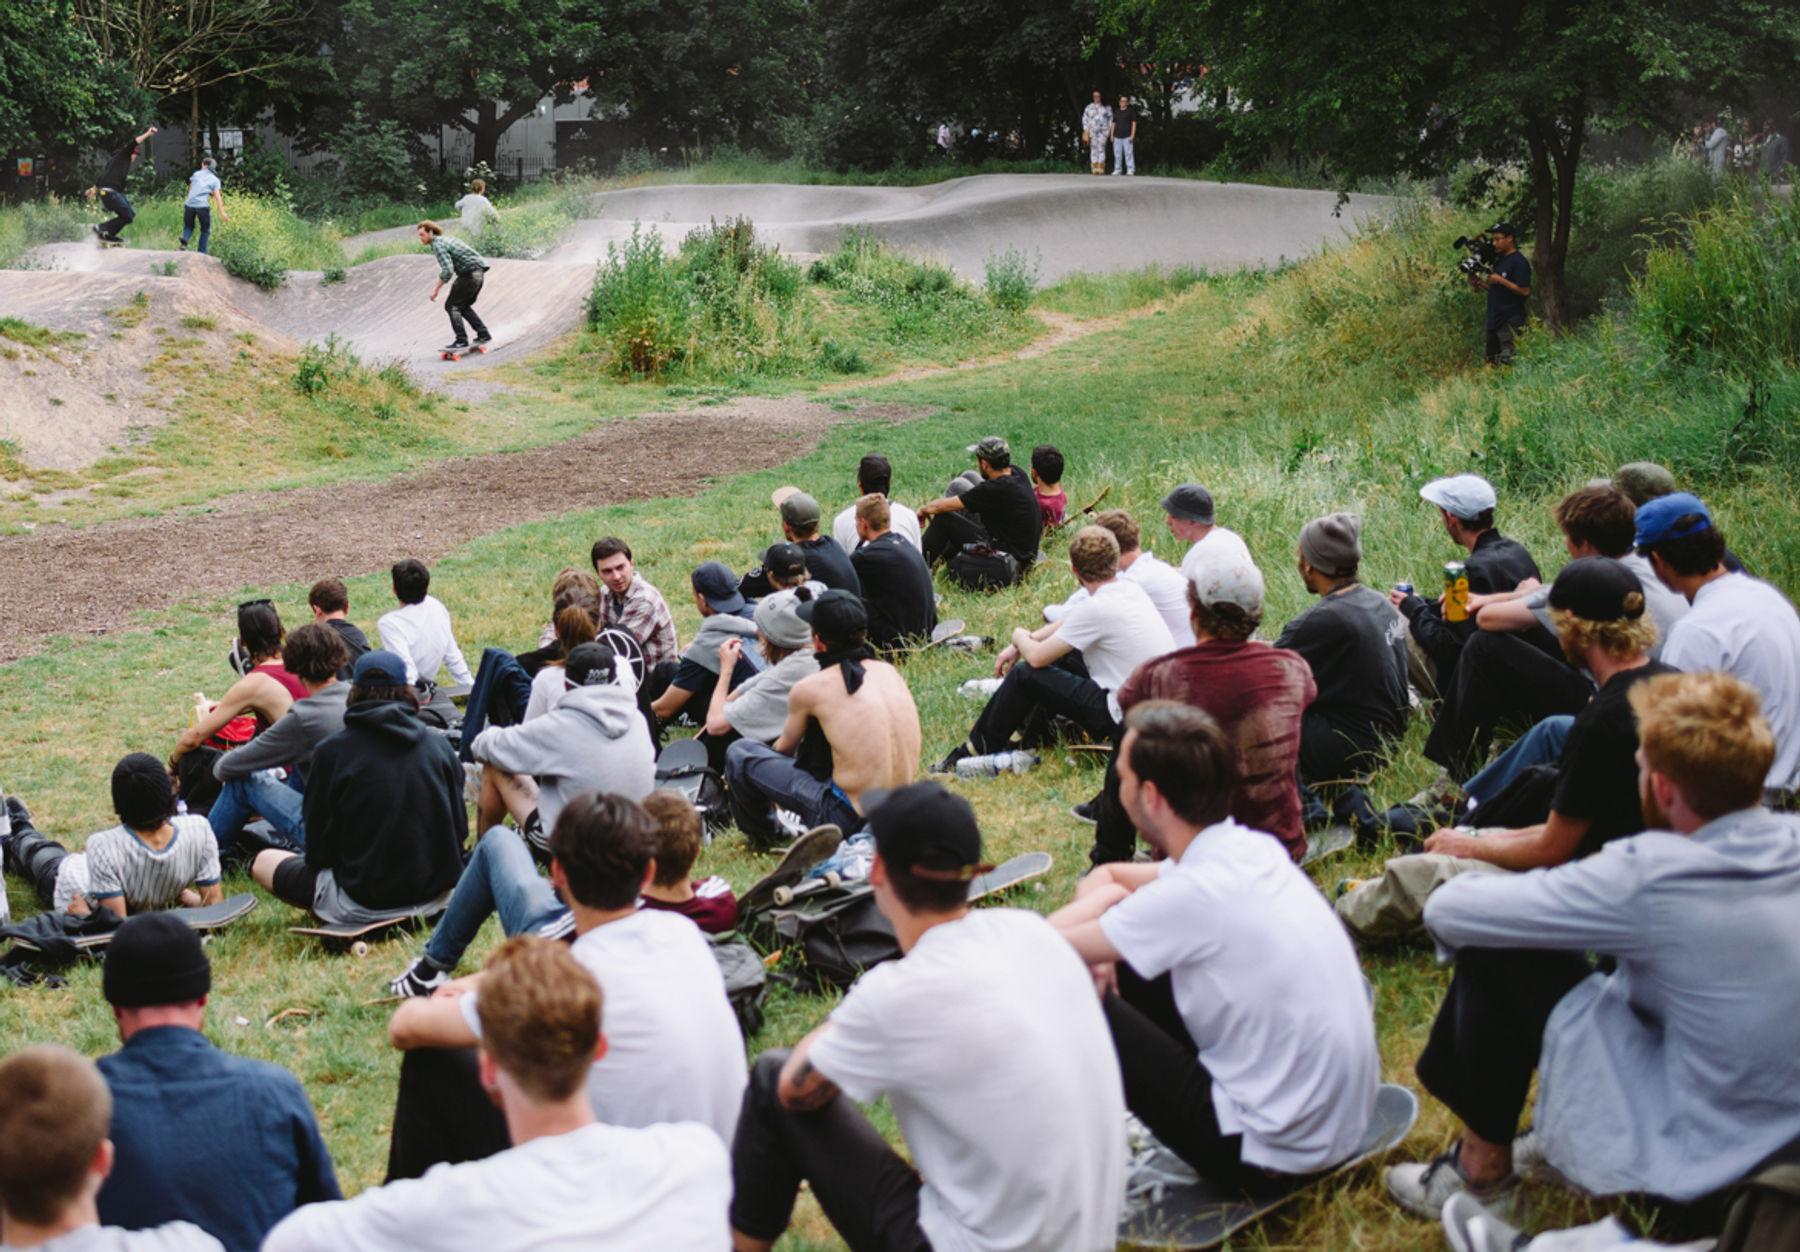 _IHC7835e-Willis-Kimbel-Nike-SB-x-Slam-City-Skates-Go-Skateboarding-Day-London-June-2015-Photographer-Maksim-Kalanep